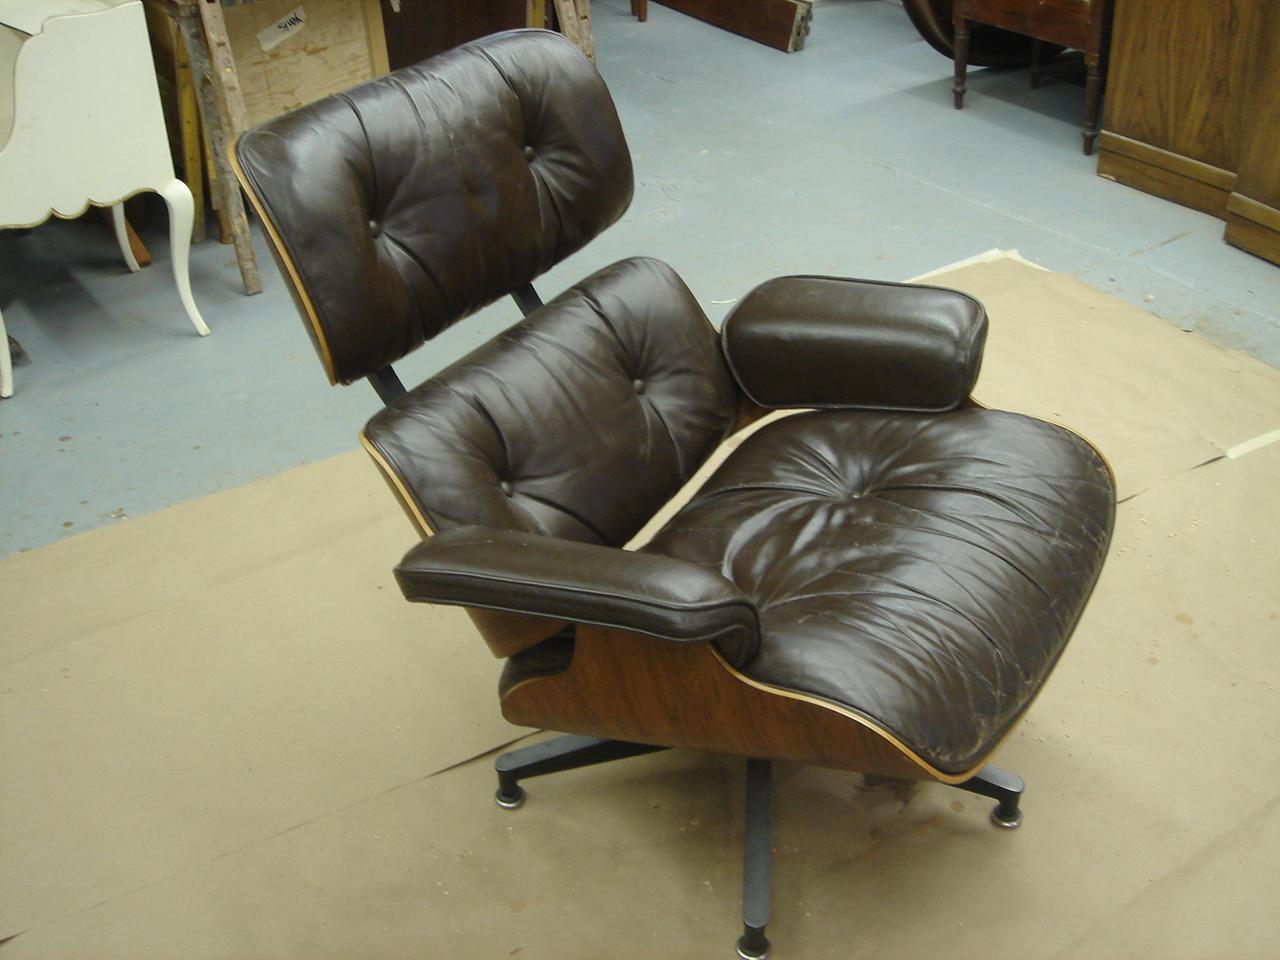 Eames Lounge Chair Shock Mount Repair : Tutorial